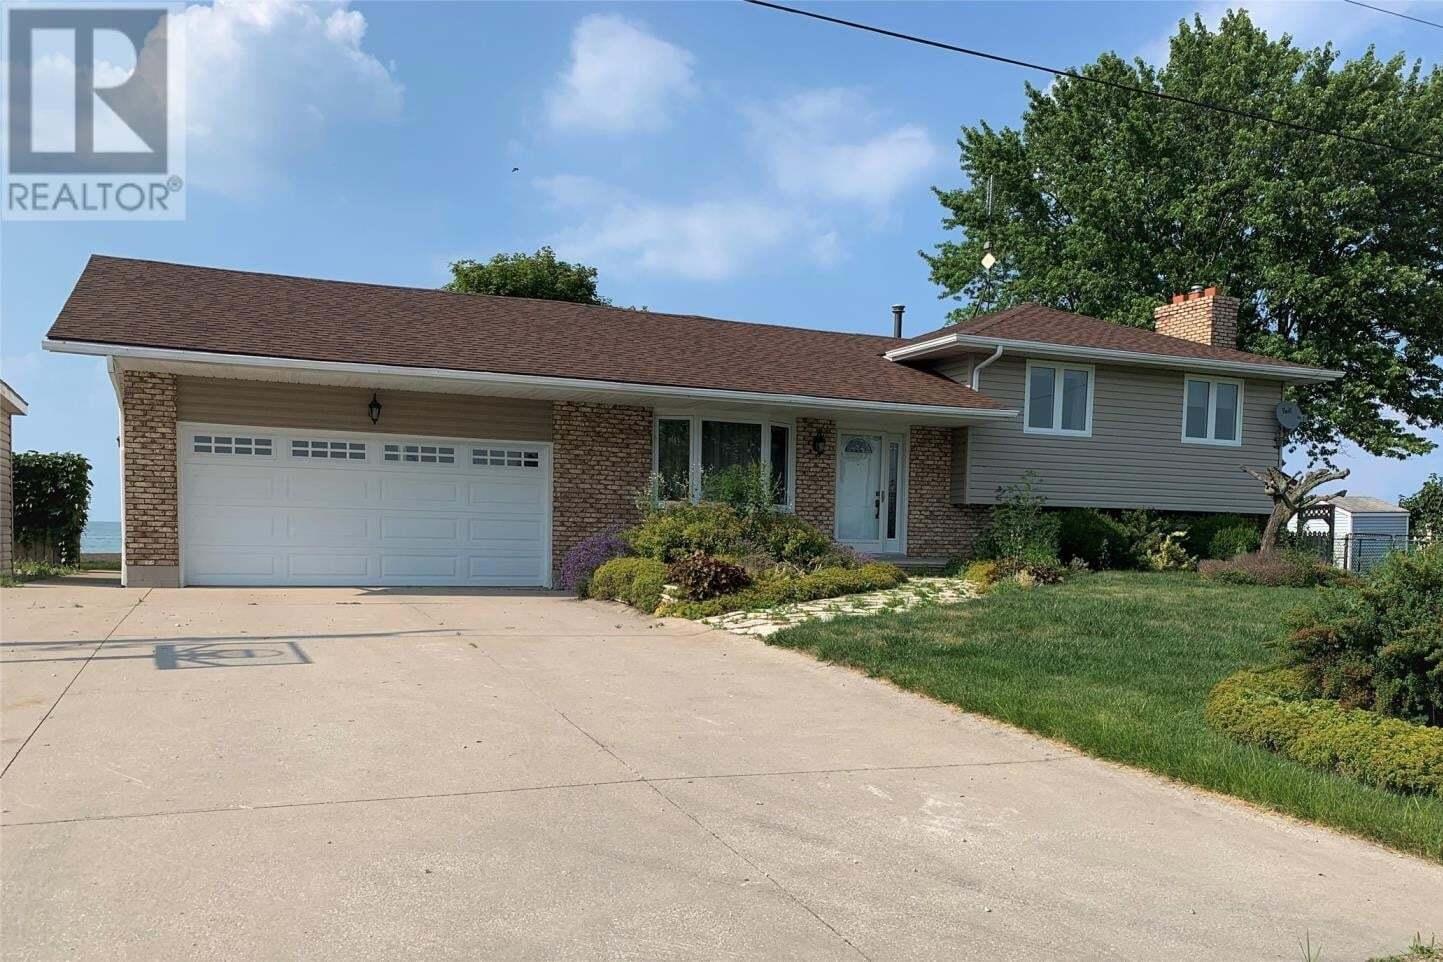 House for sale at 871 Lakeshore Park  Lakeshore Ontario - MLS: 20008194